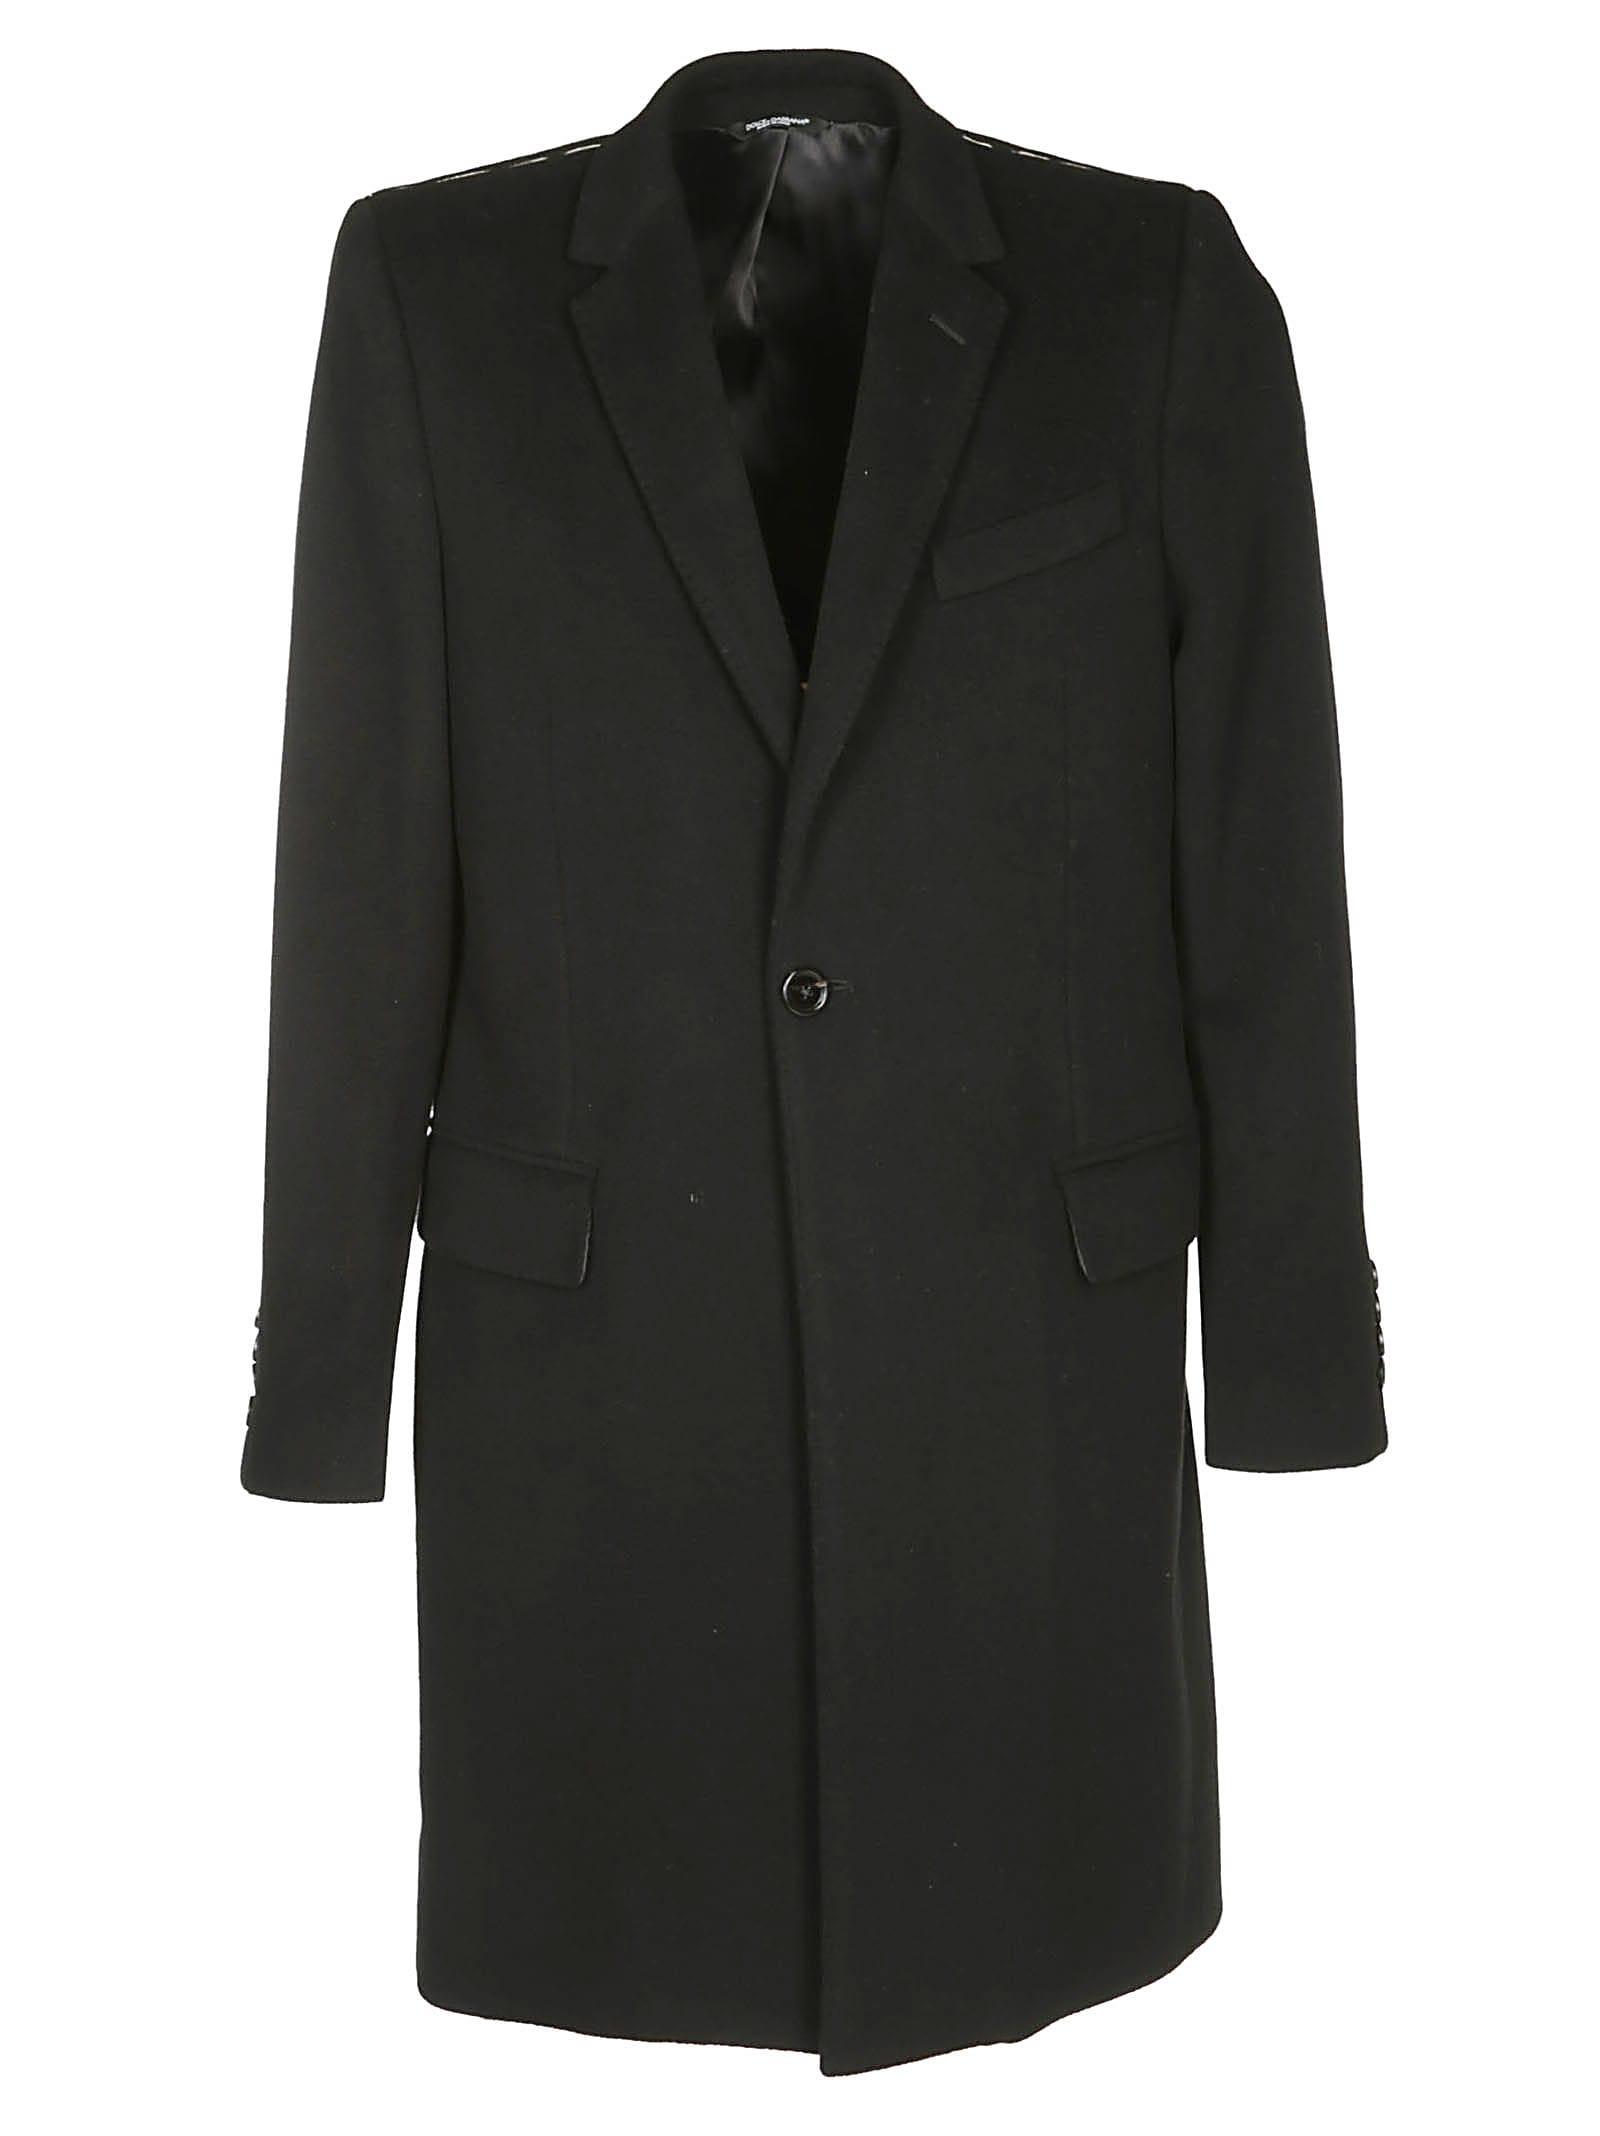 Dolce & Gabbana Black Wool-cashmere Blend Coat